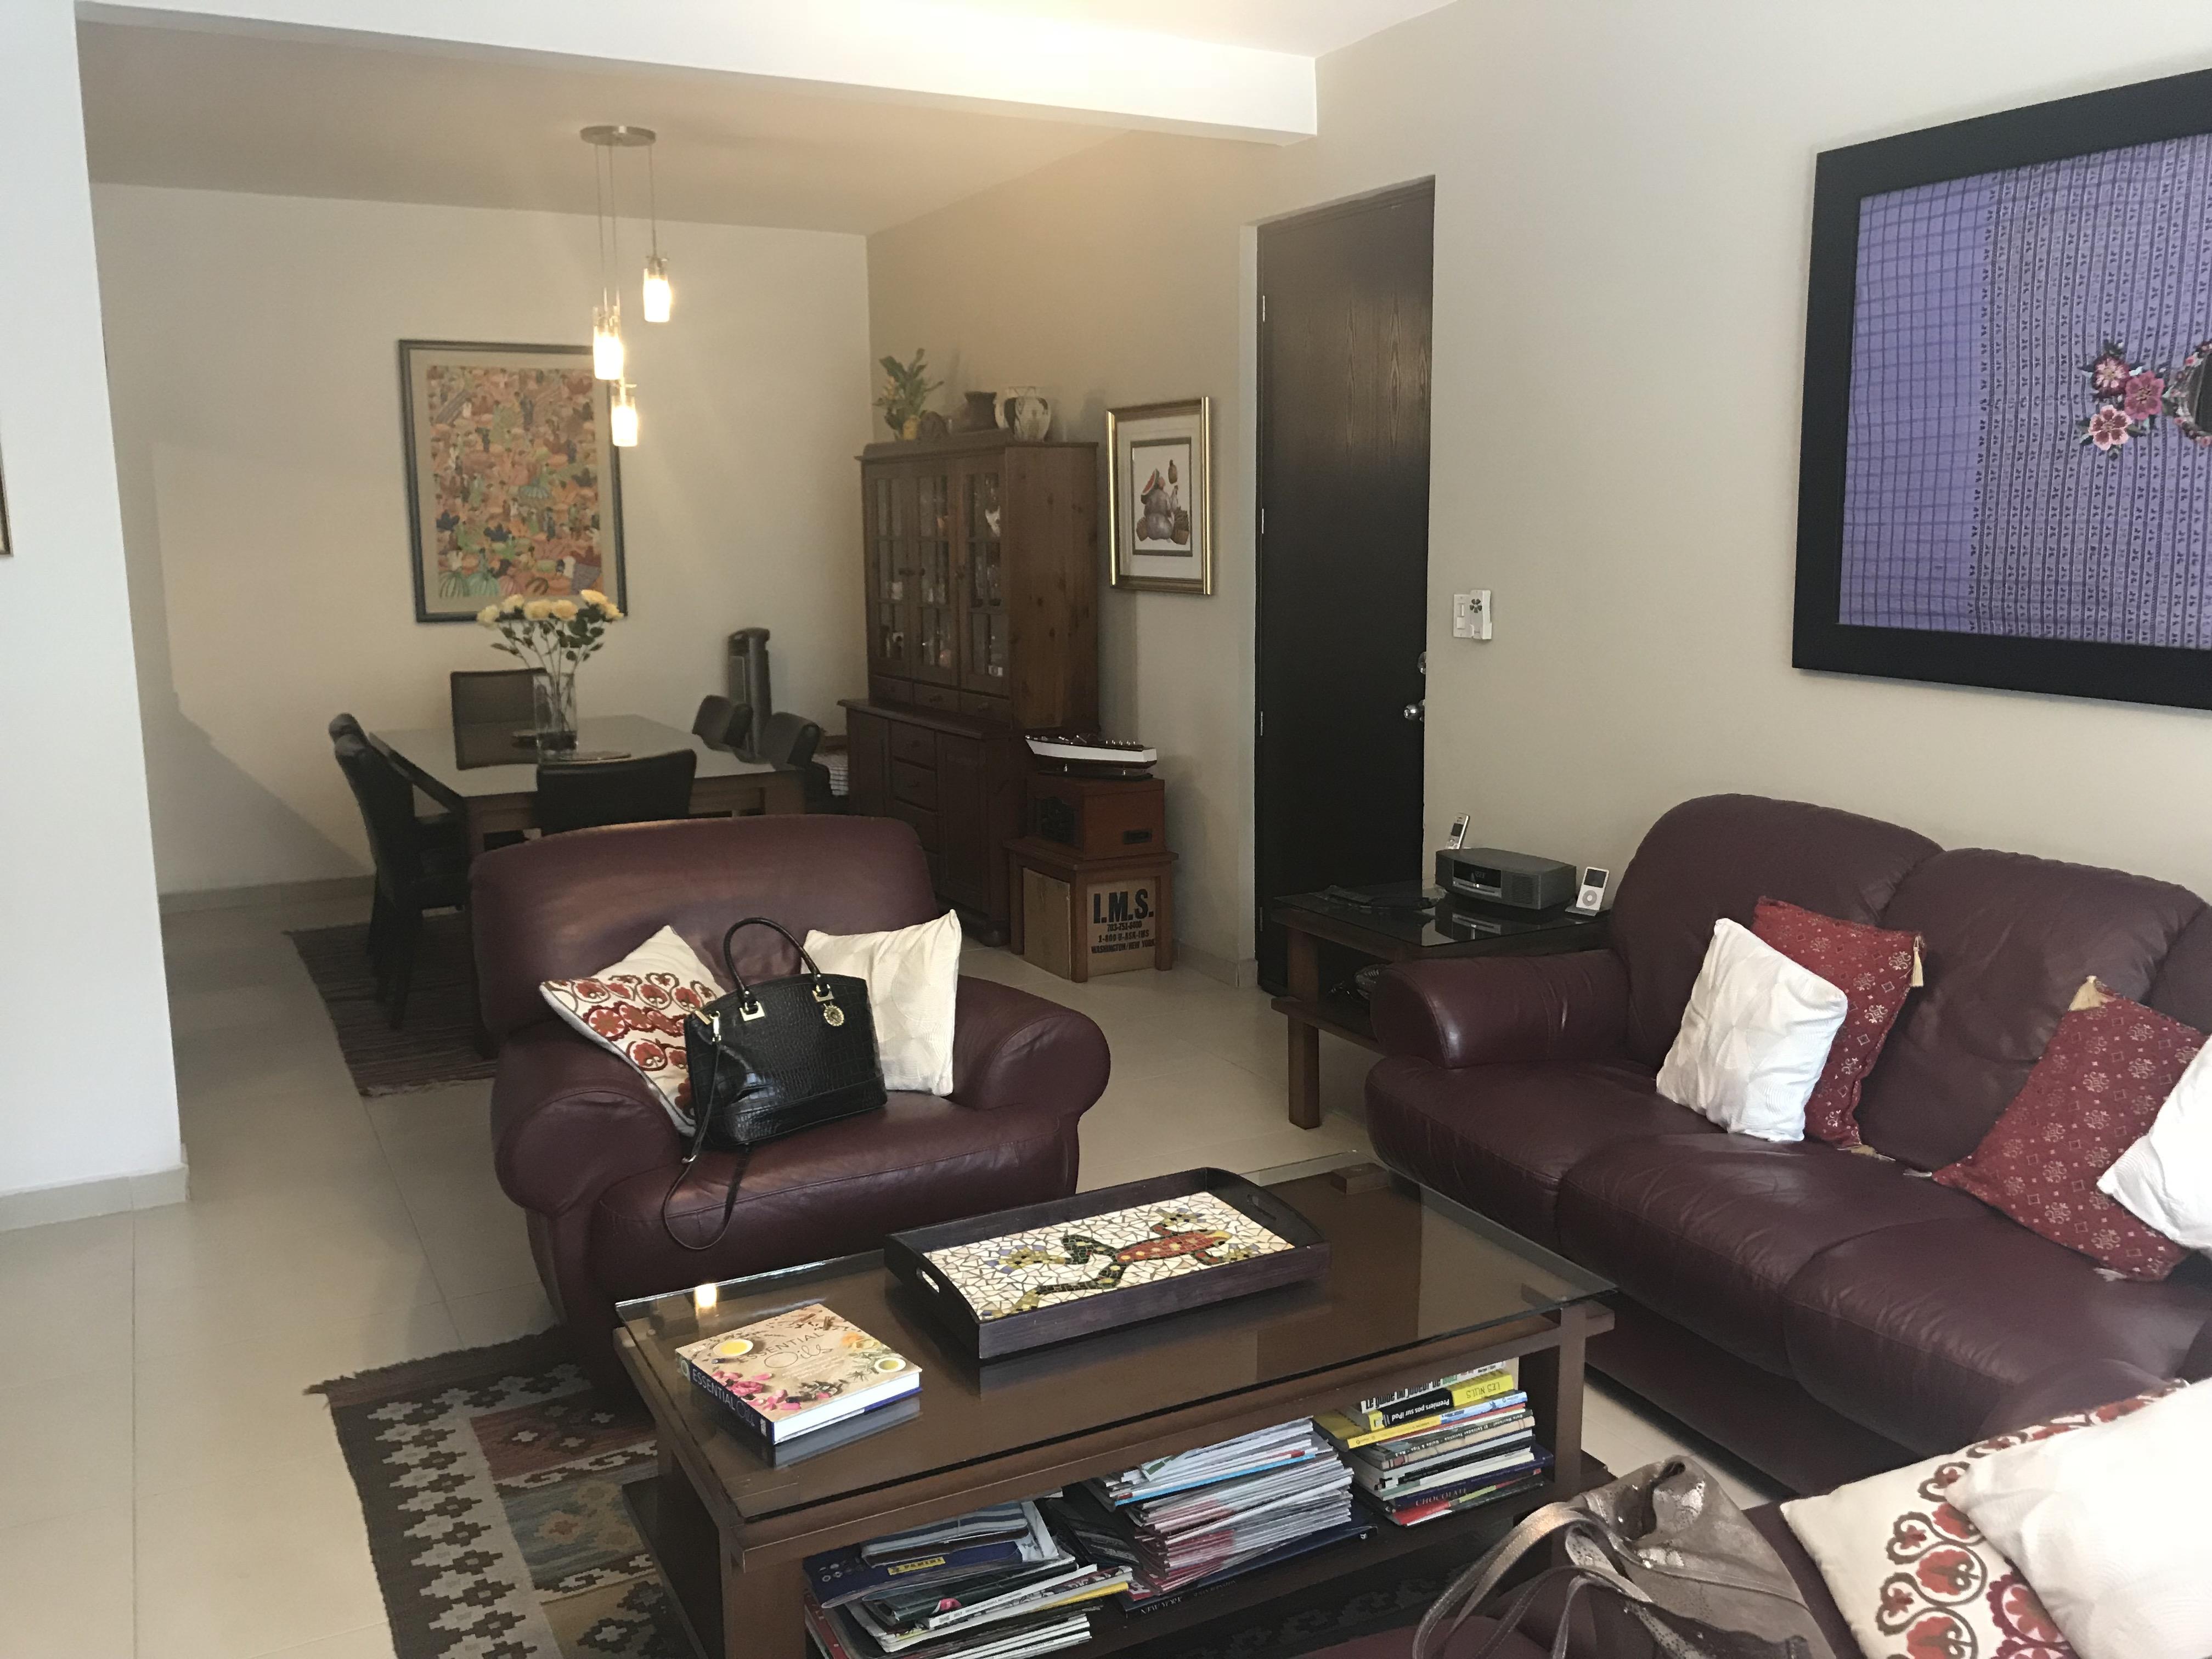 SBA0102 Apartamento en Venta San Benito sala comedor 2